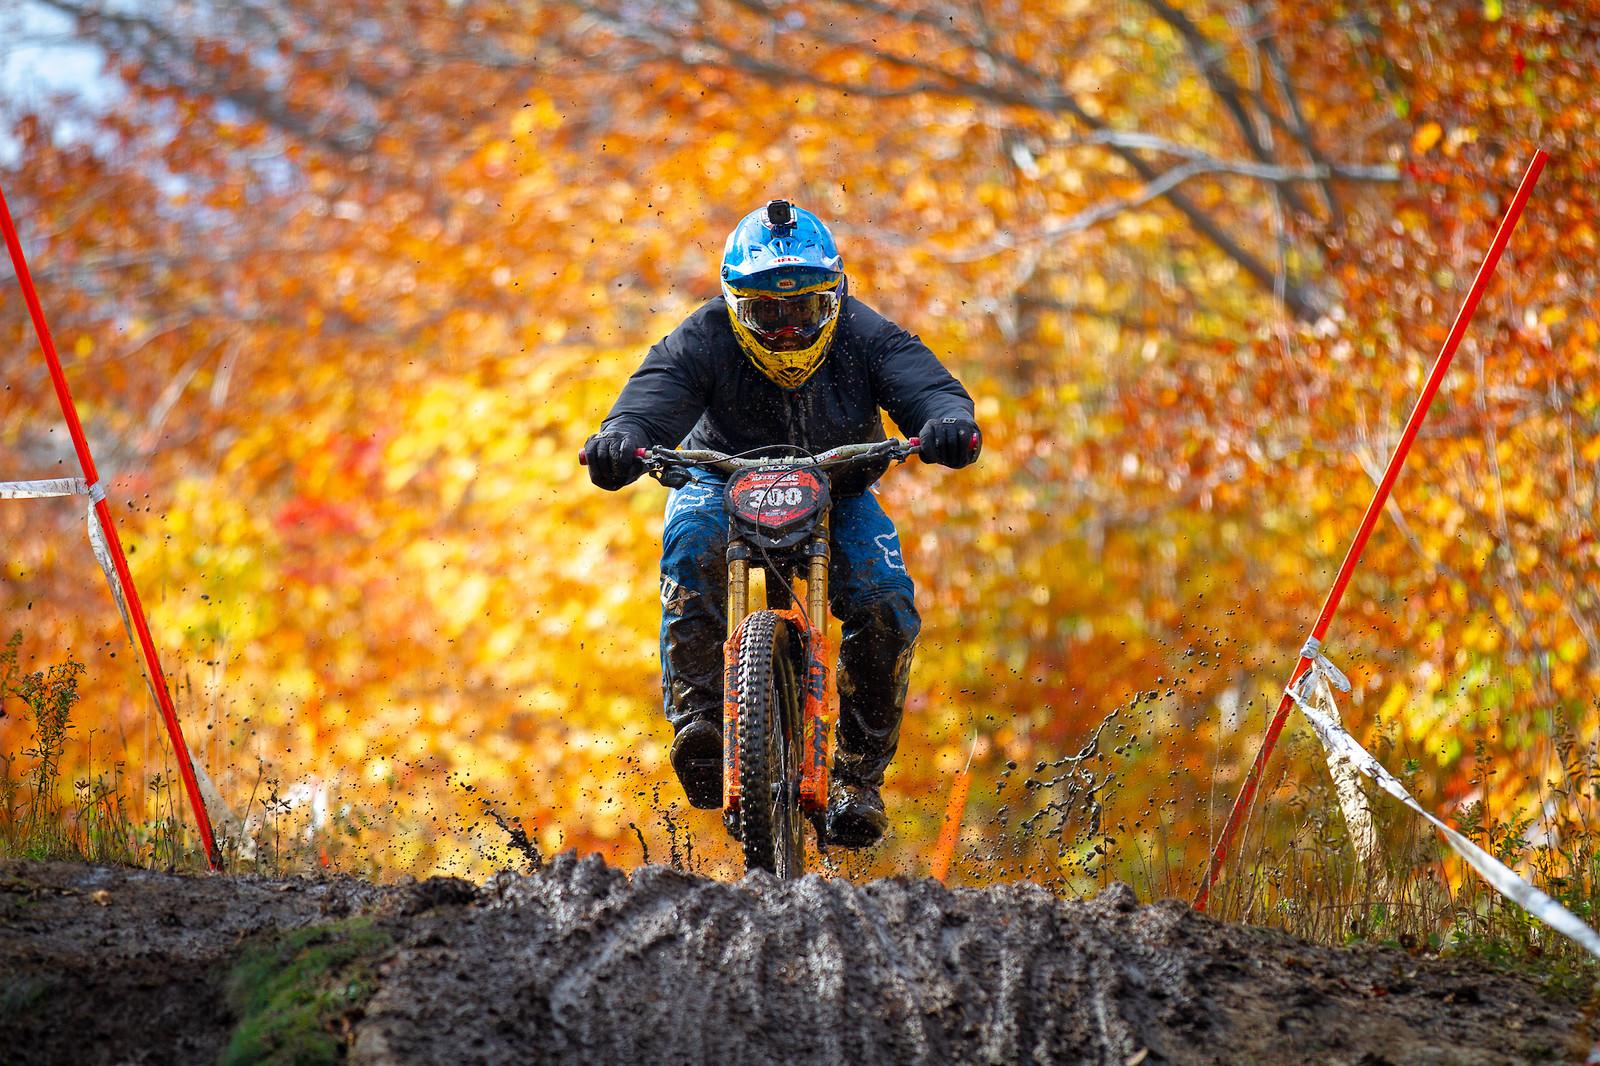 Paulo Henrique Ferriera Martin - JackRice - Mountain Biking Pictures - Vital MTB